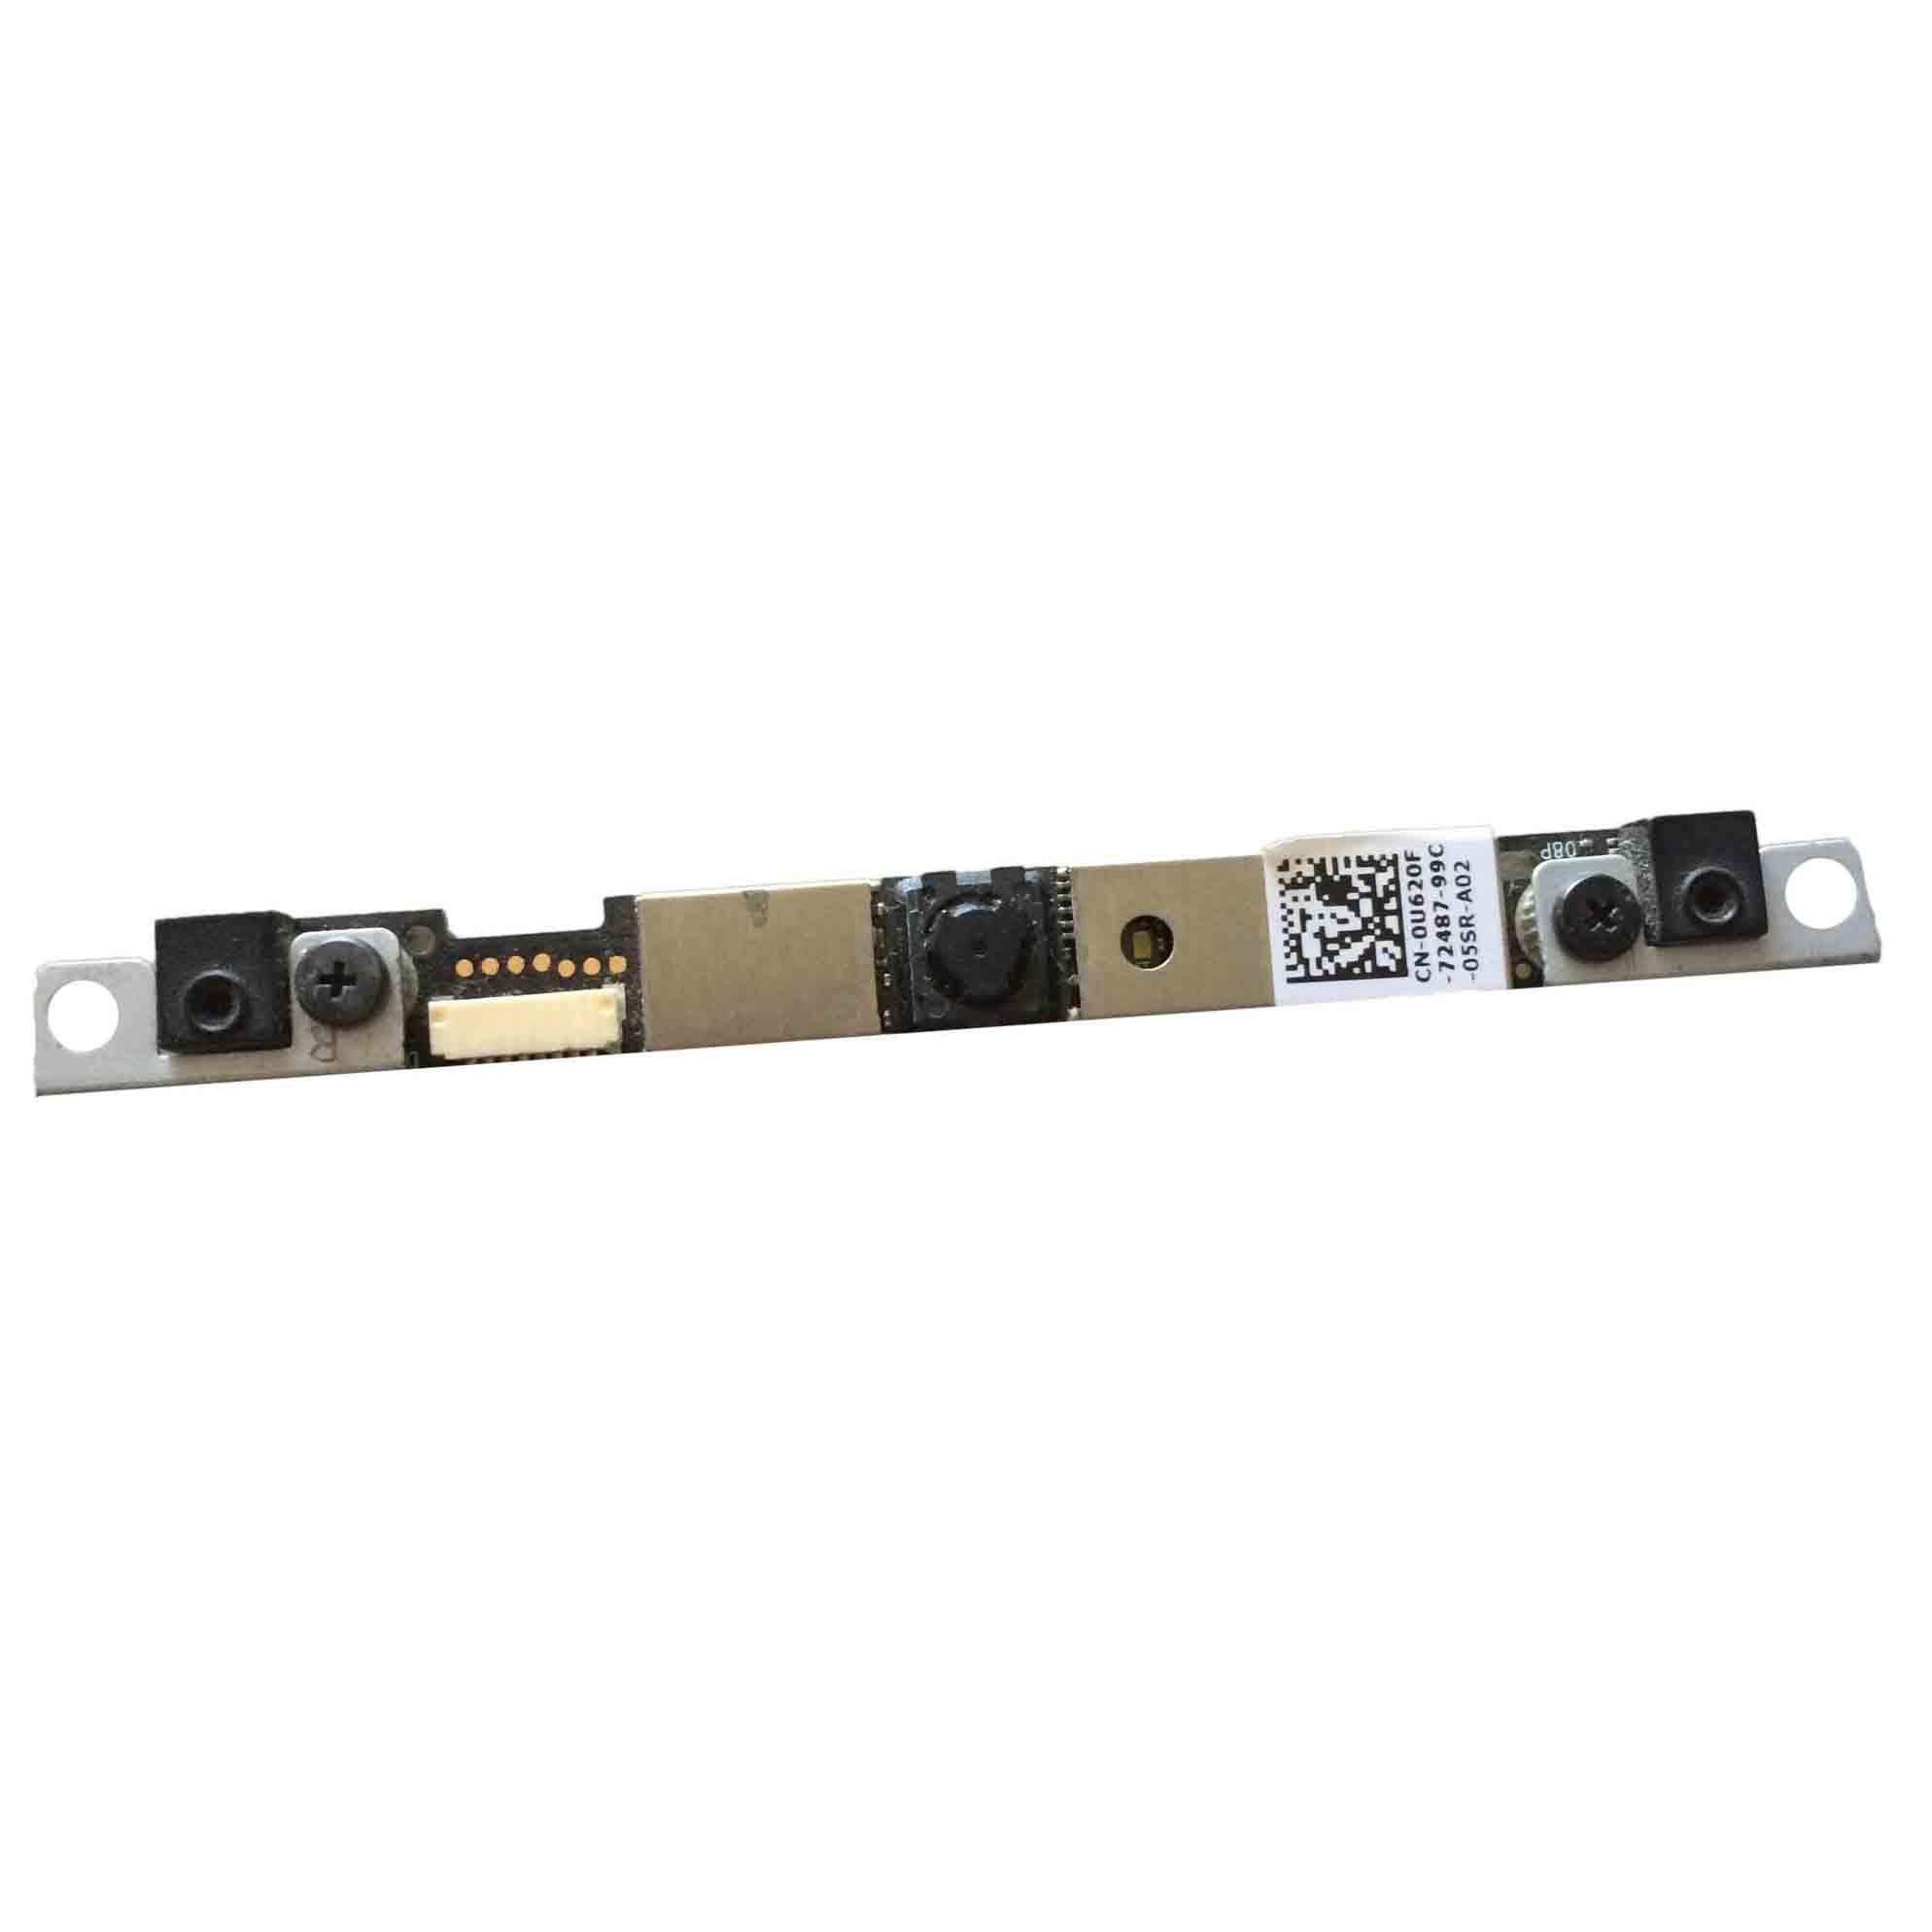 Webcam Interna P/ Notebook Dell Inspiron 1545 Cx92 PN:Cn-ou620f-72487-99m-odmn-a02  - Retirado